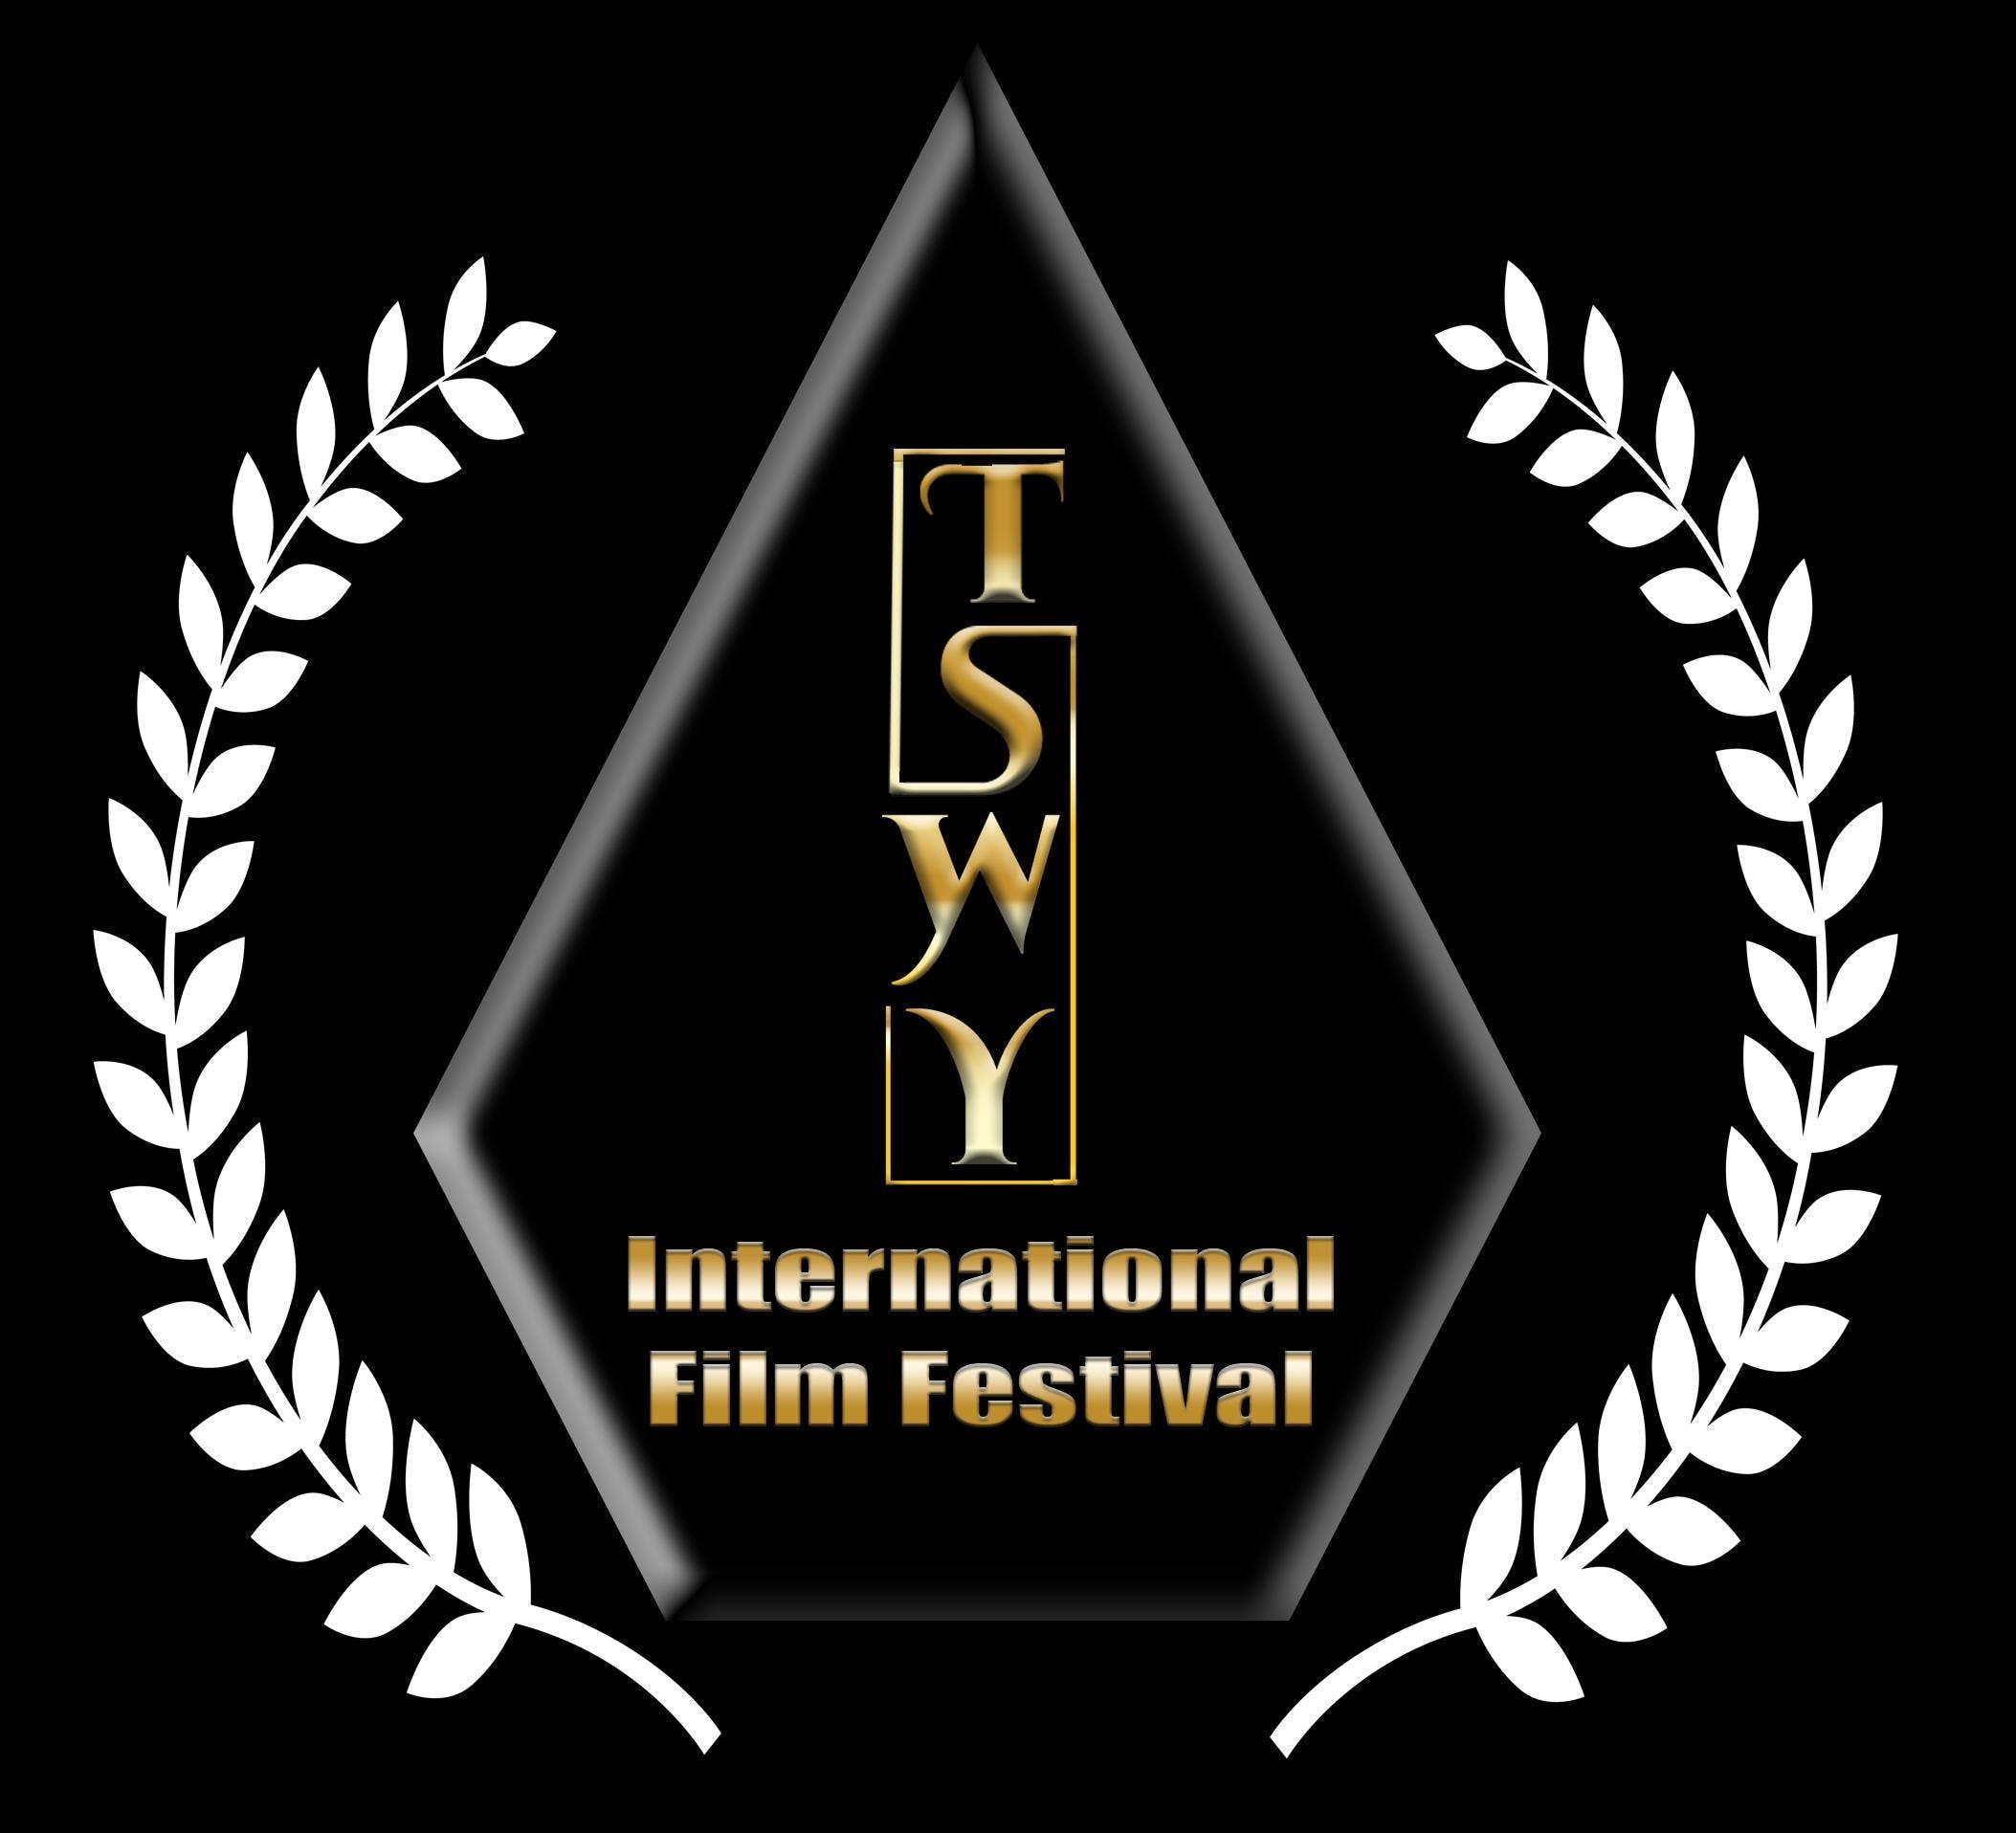 2nd TSWY International Film Festival